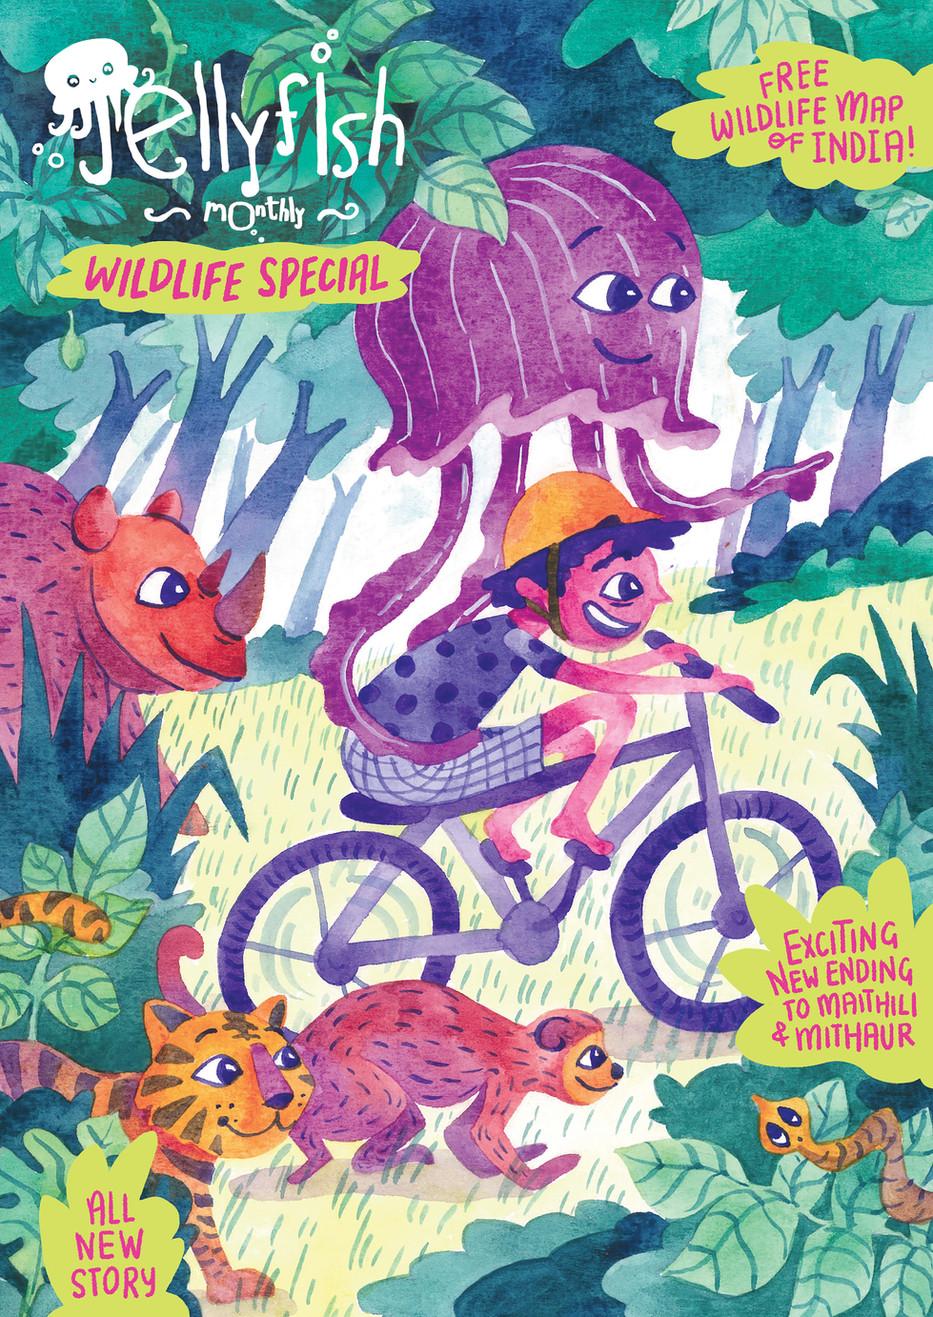 Jellyfish Monthly - Magazine Cover